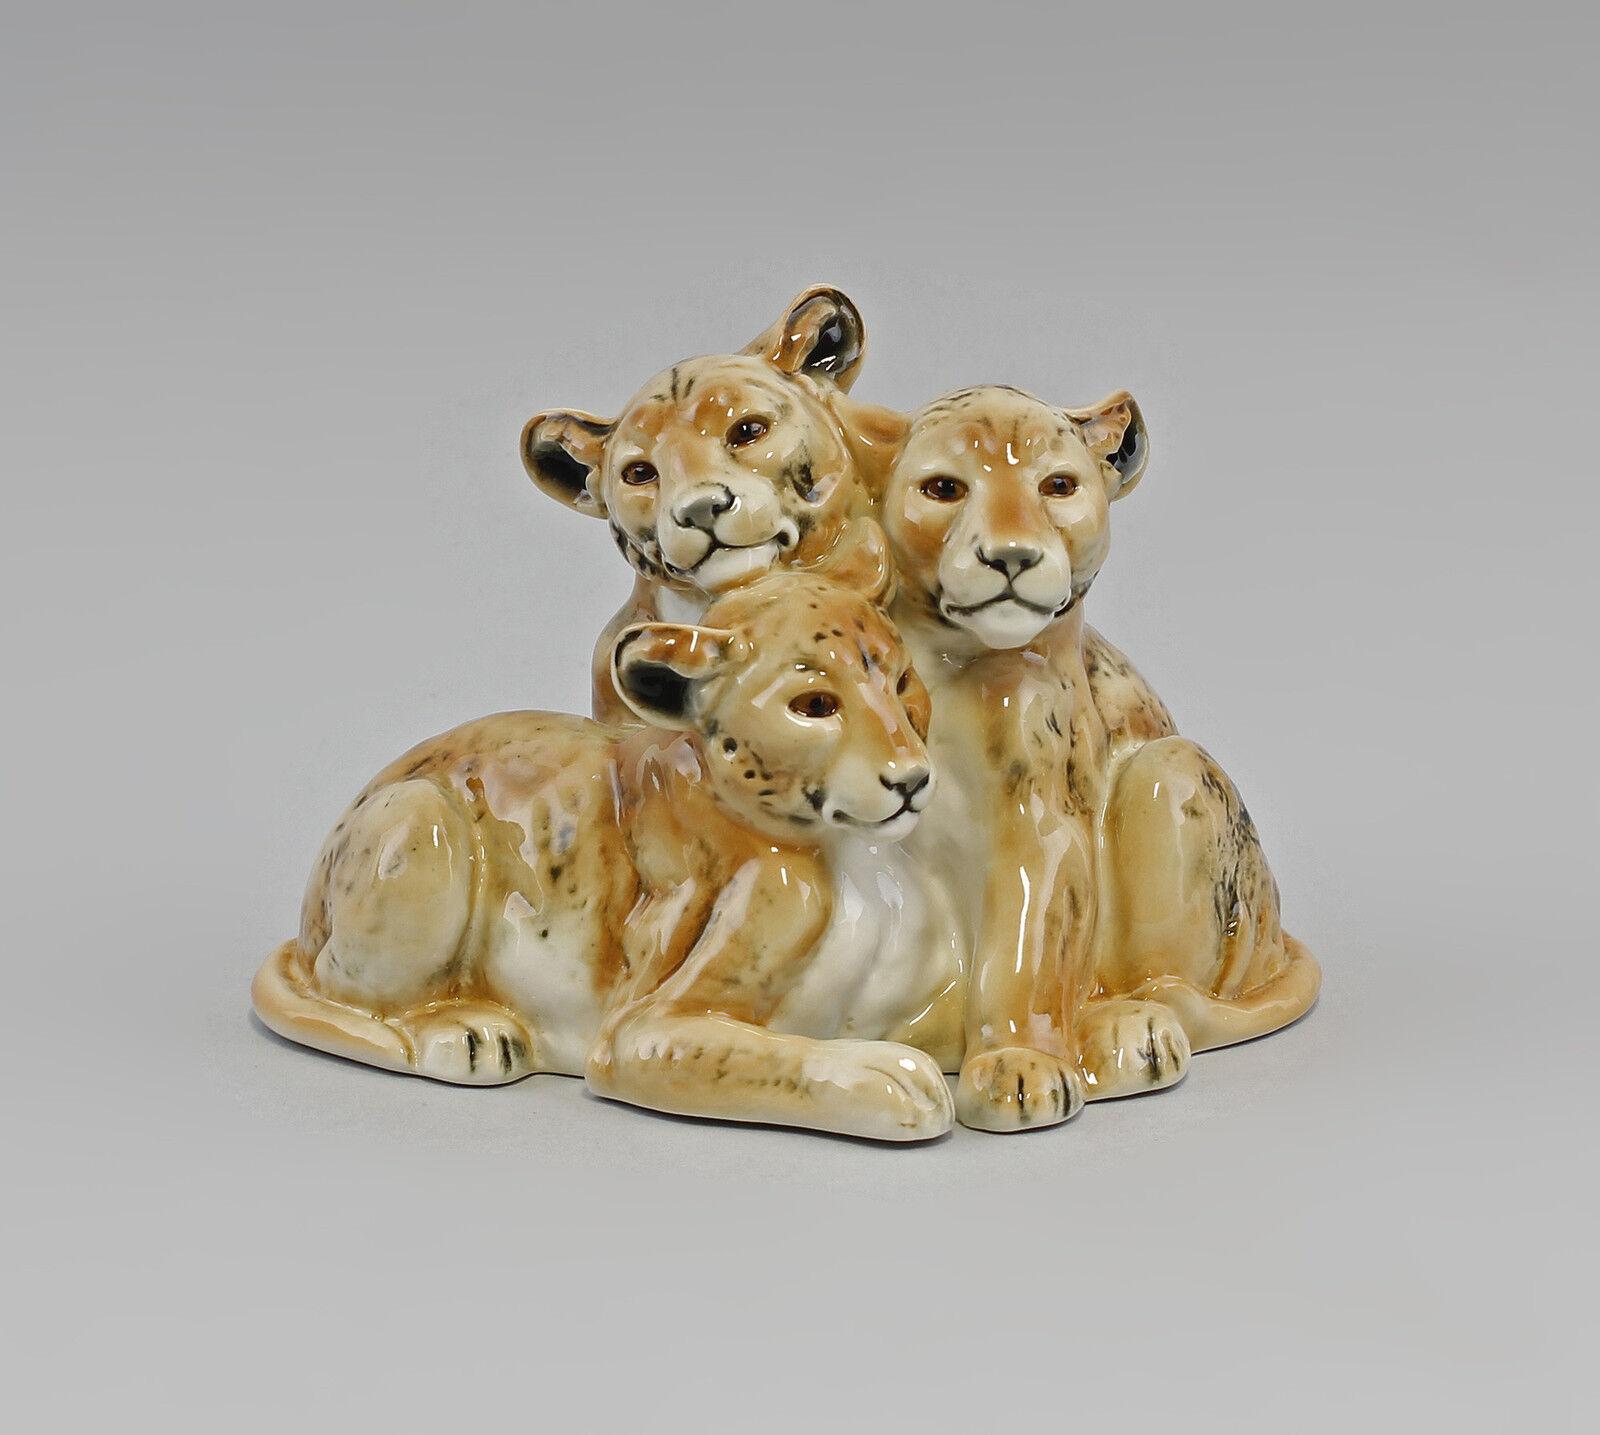 Porzellan Figur Löwenbaby-Gruppe Ens 17x13cm 9941630